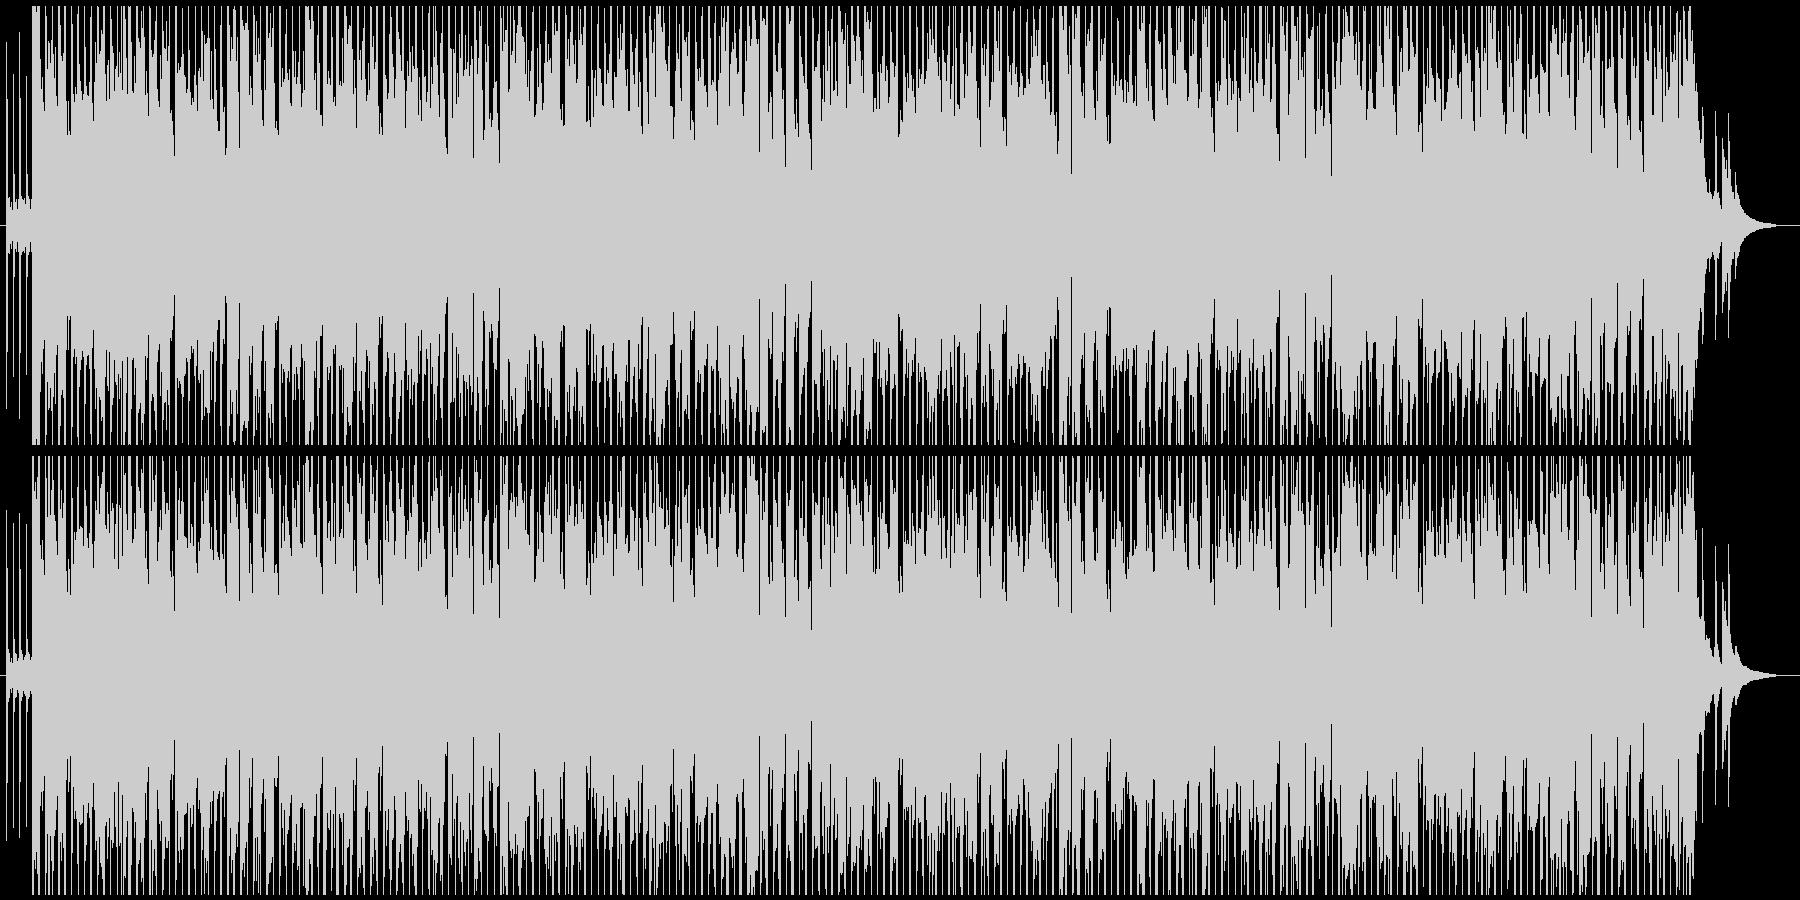 Blue sky, smile, nature / Nori refreshing acoustic guitar pops's unreproduced waveform